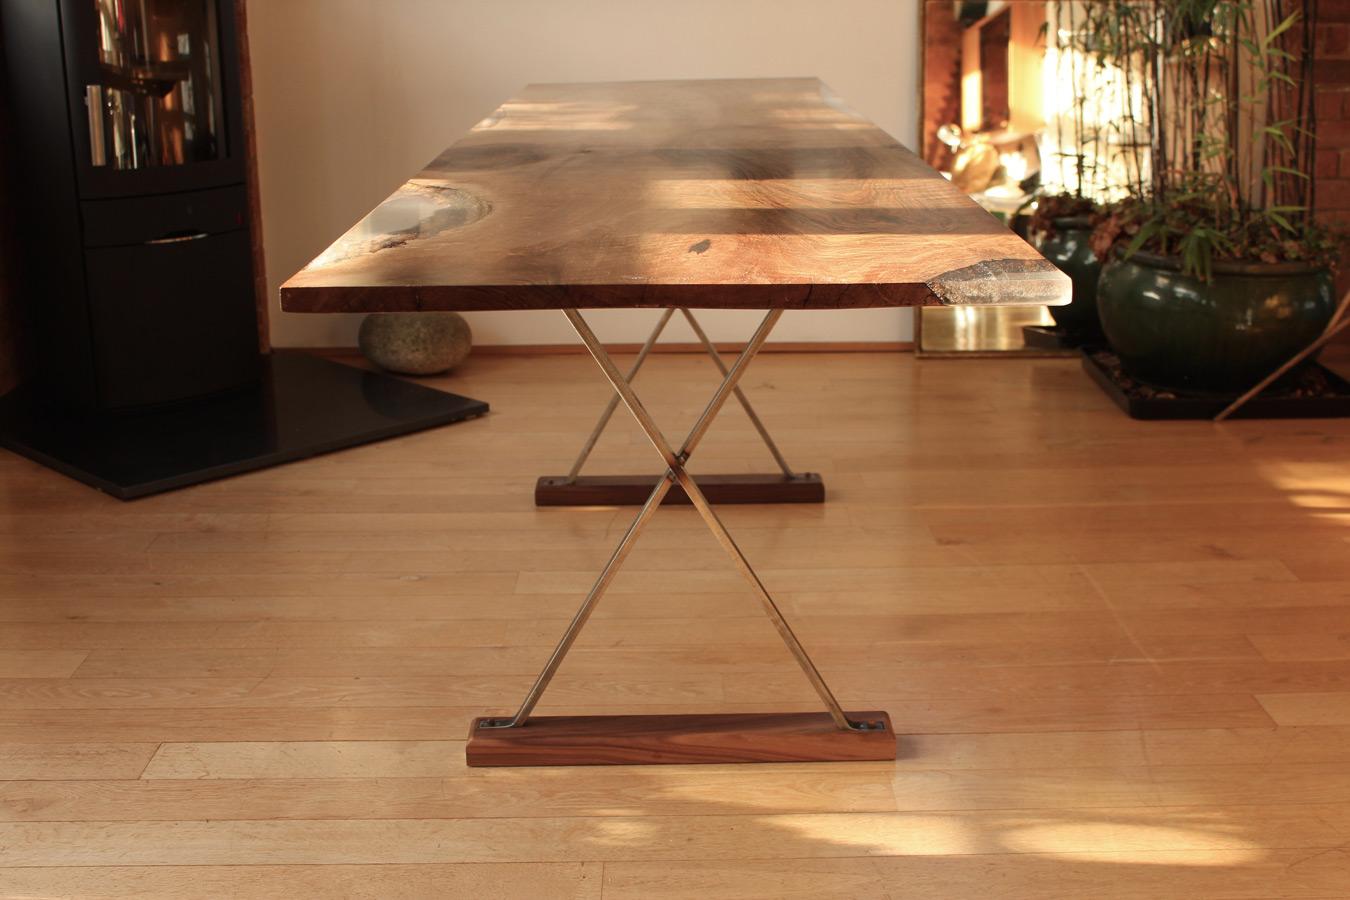 30_Ripple-English-walnut-table-with-cross-legs_1.jpg